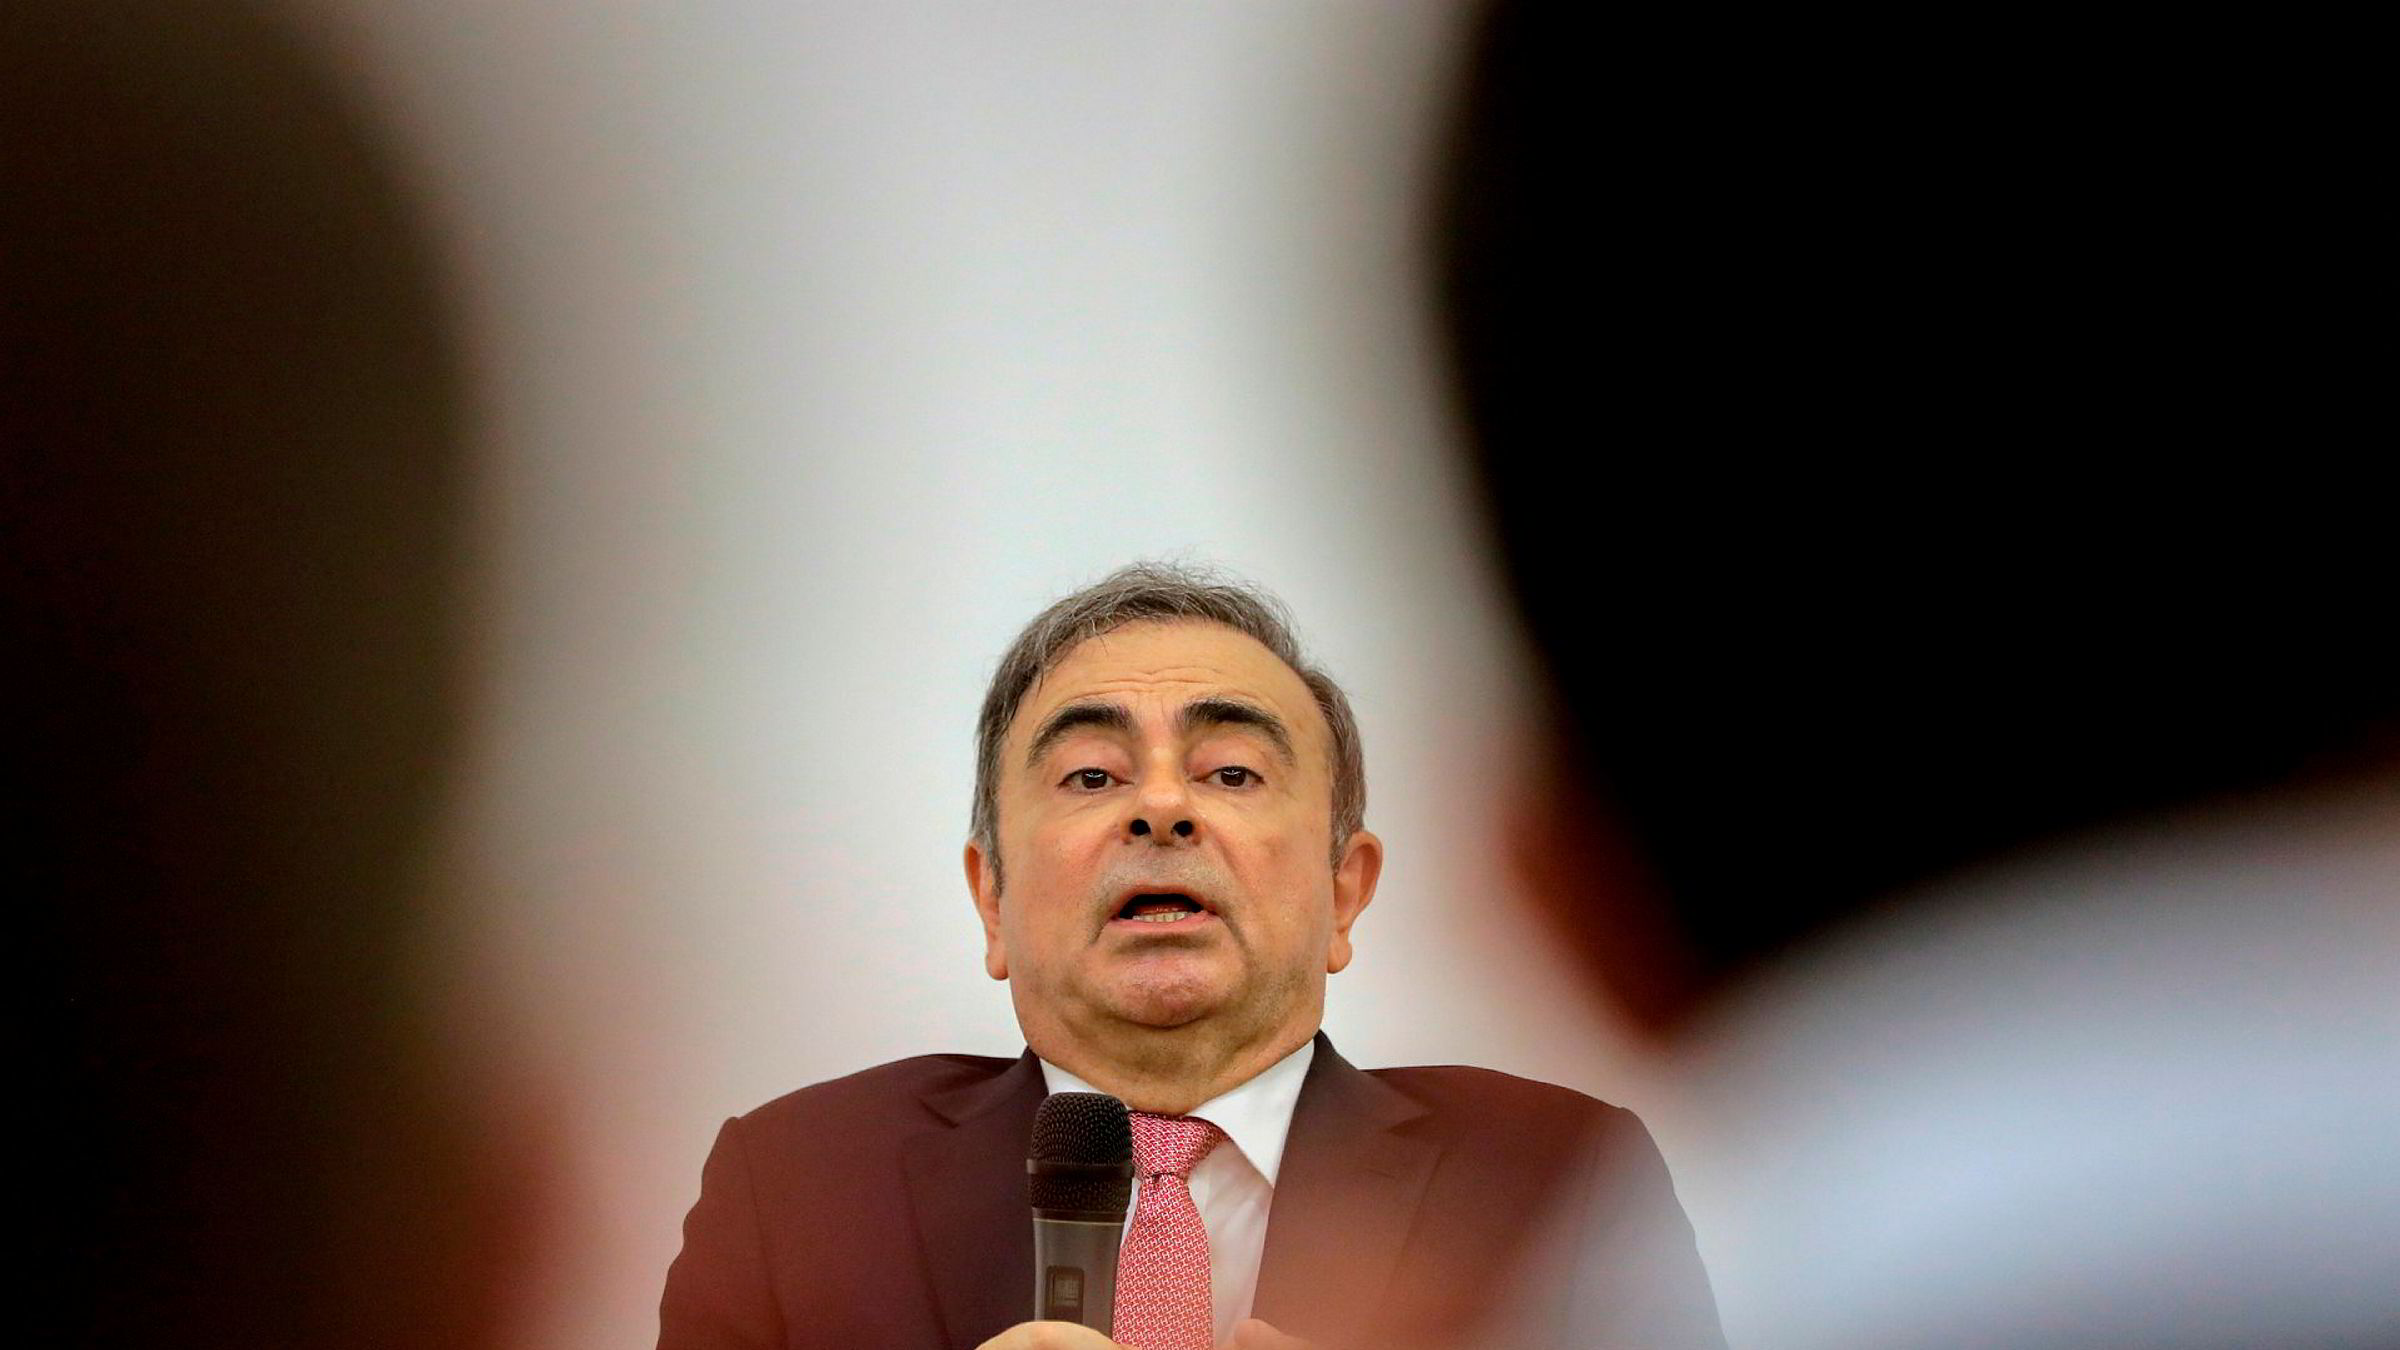 Tidligere Renault-Nissan-sjef Carlos Ghosn får ikke forlate Libanon.